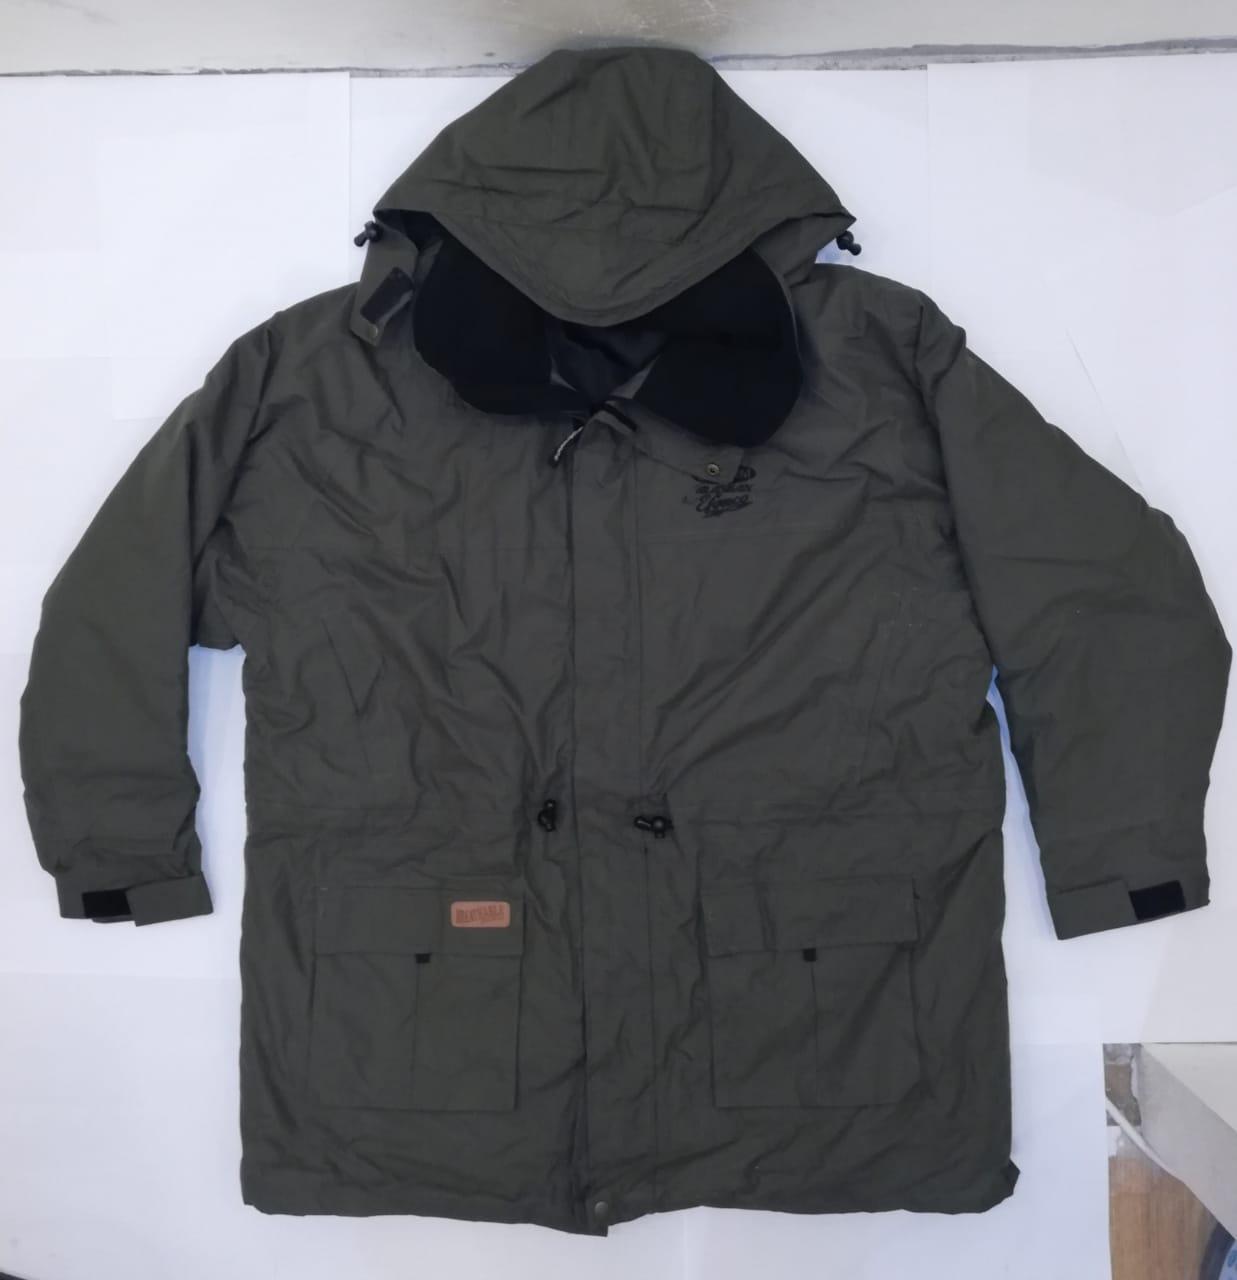 Костюм зимний Storm Alaskan by Efgeeco XXXXL в Москве 89263358081 купить 1